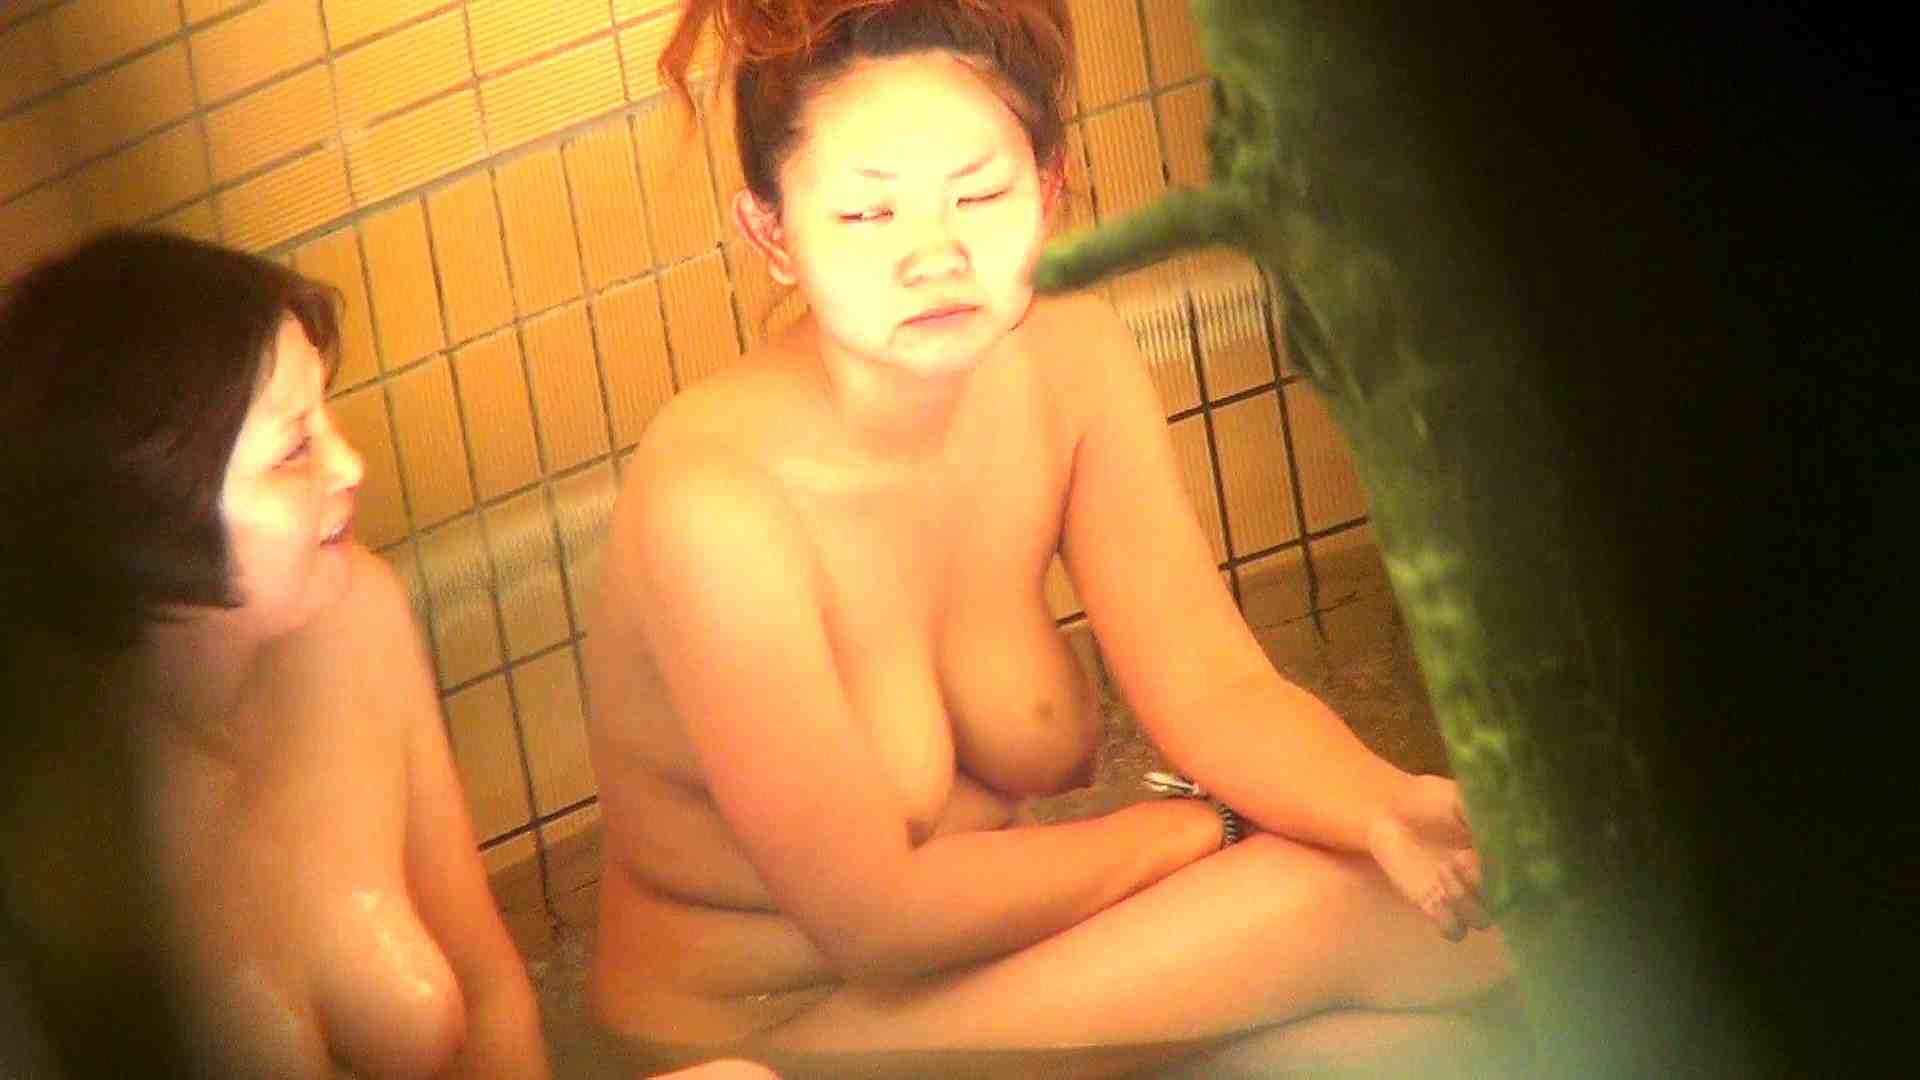 Vol.37 オデブと妊婦とokaasann 巨乳 ワレメ無修正動画無料 94枚 65